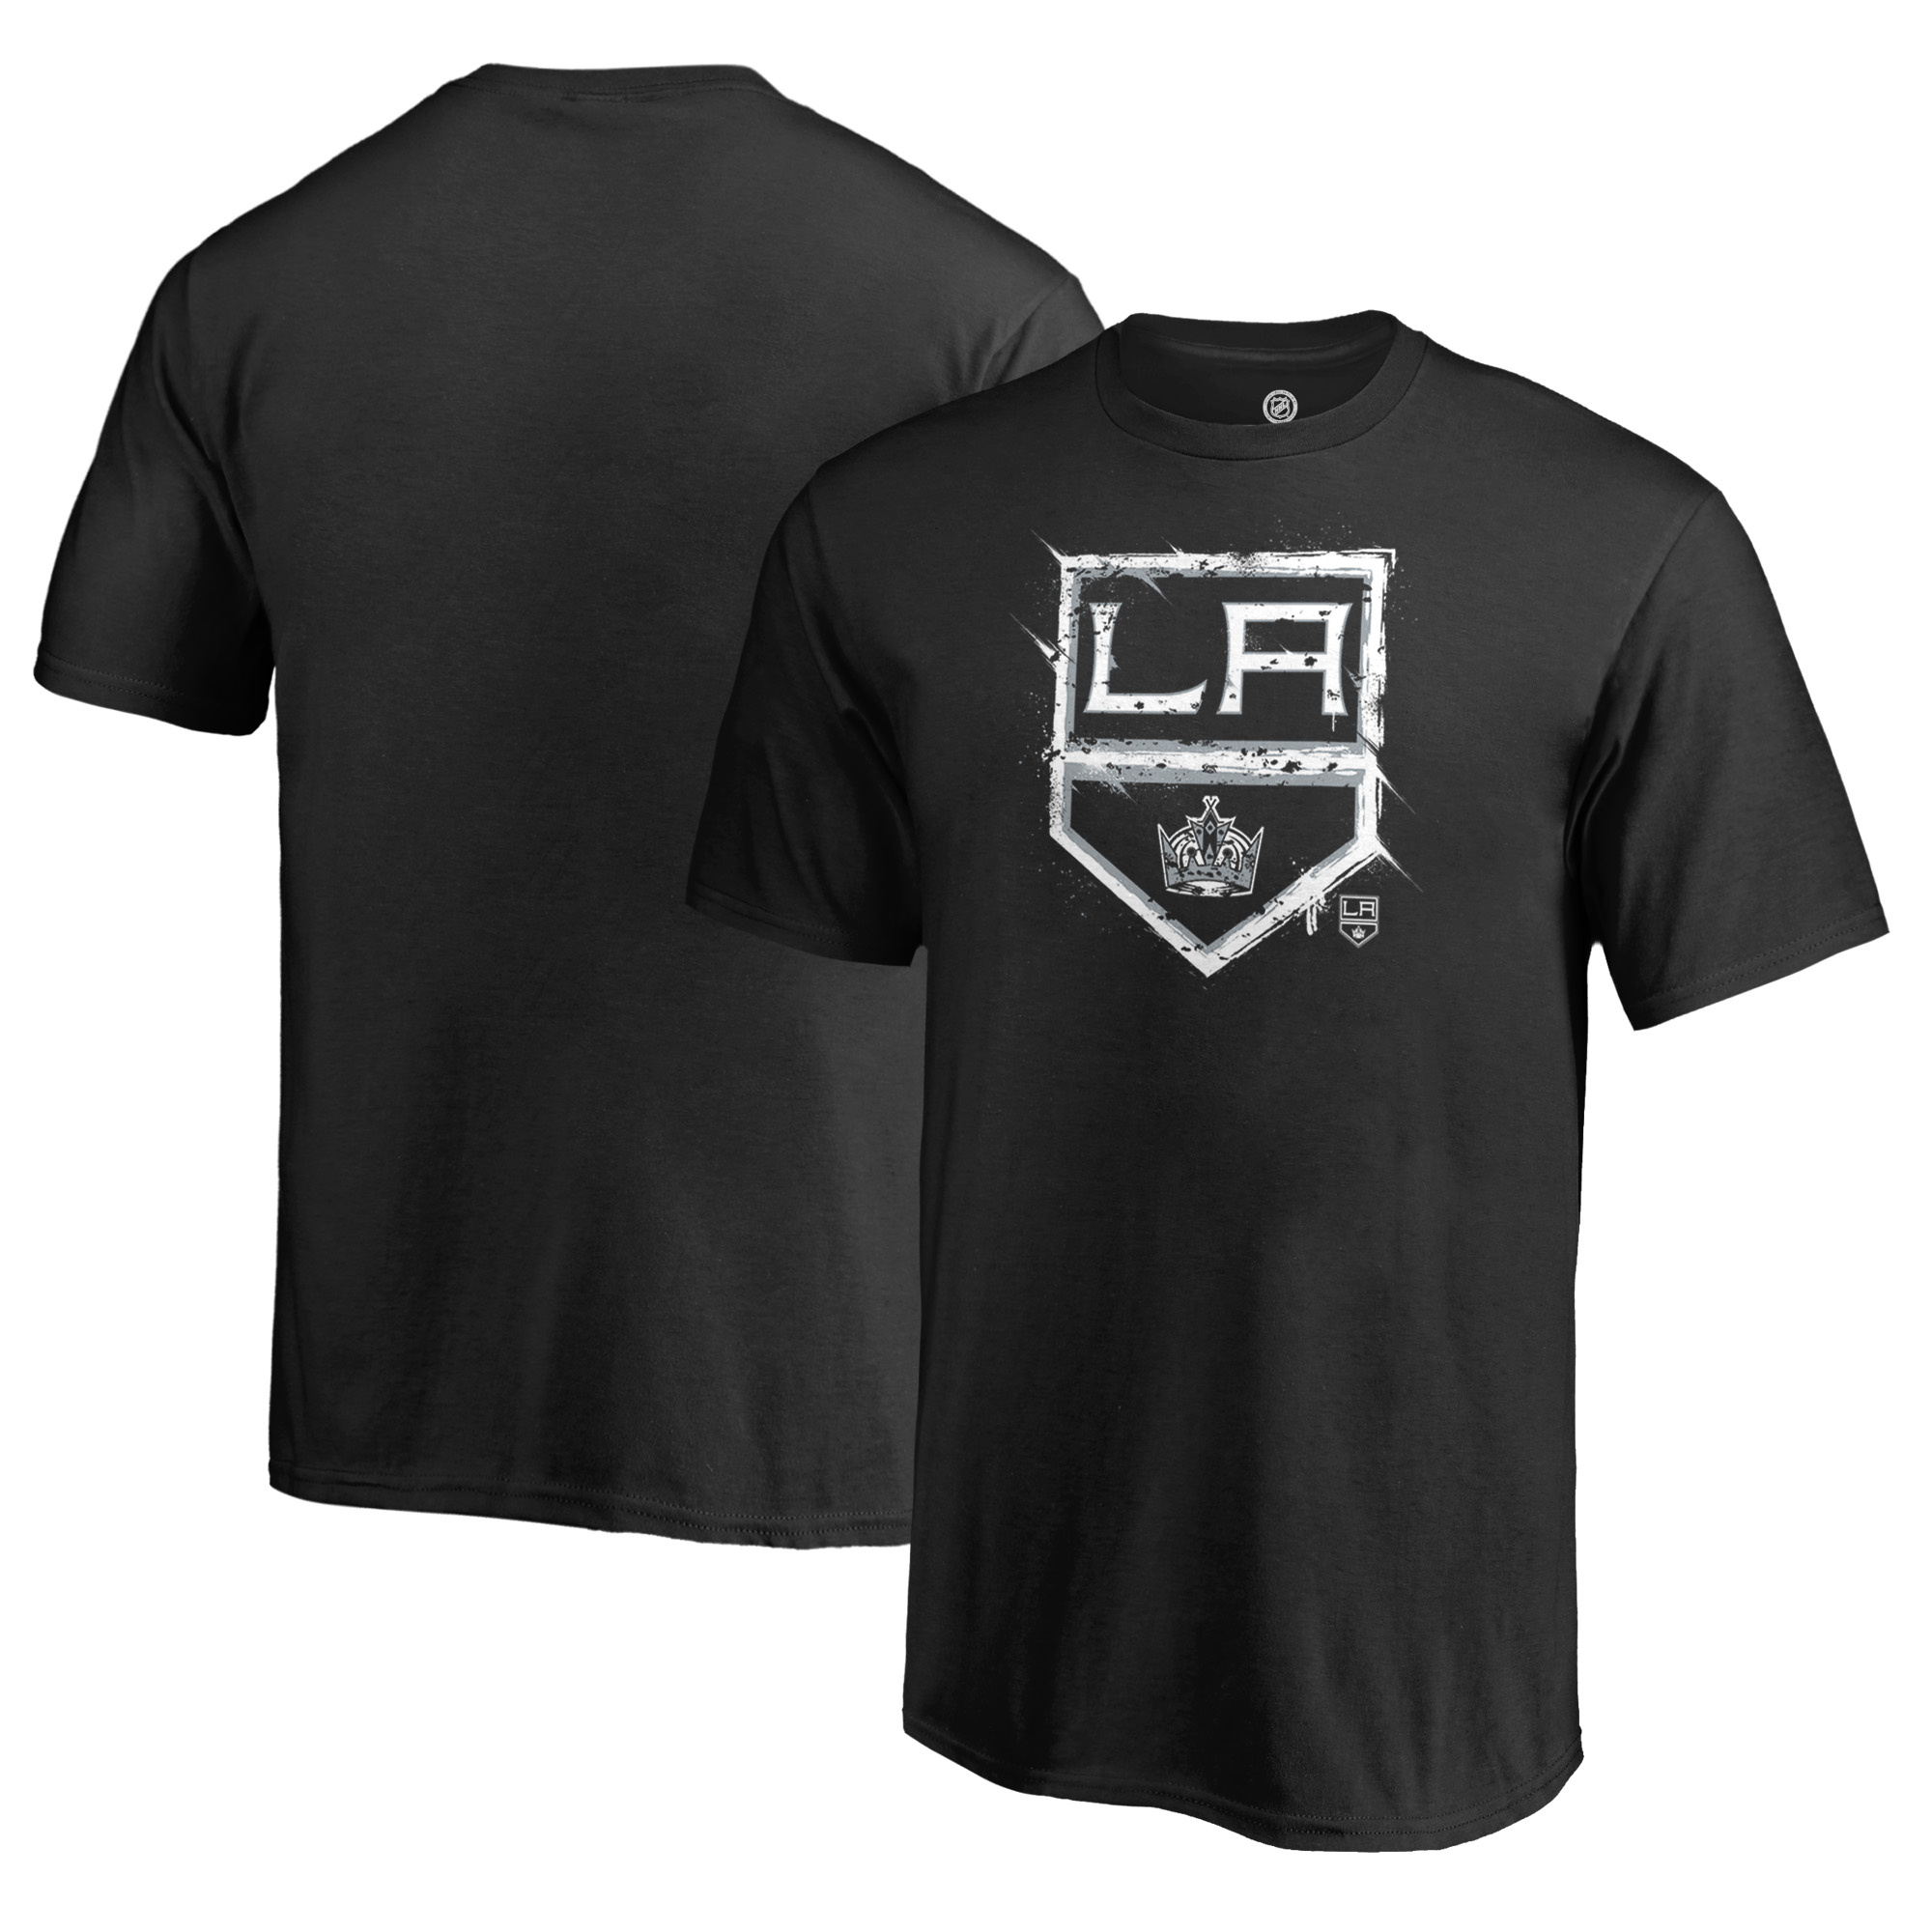 Los Angeles Kings Fanatics Branded Youth Splatter Logo T-Shirt - Black